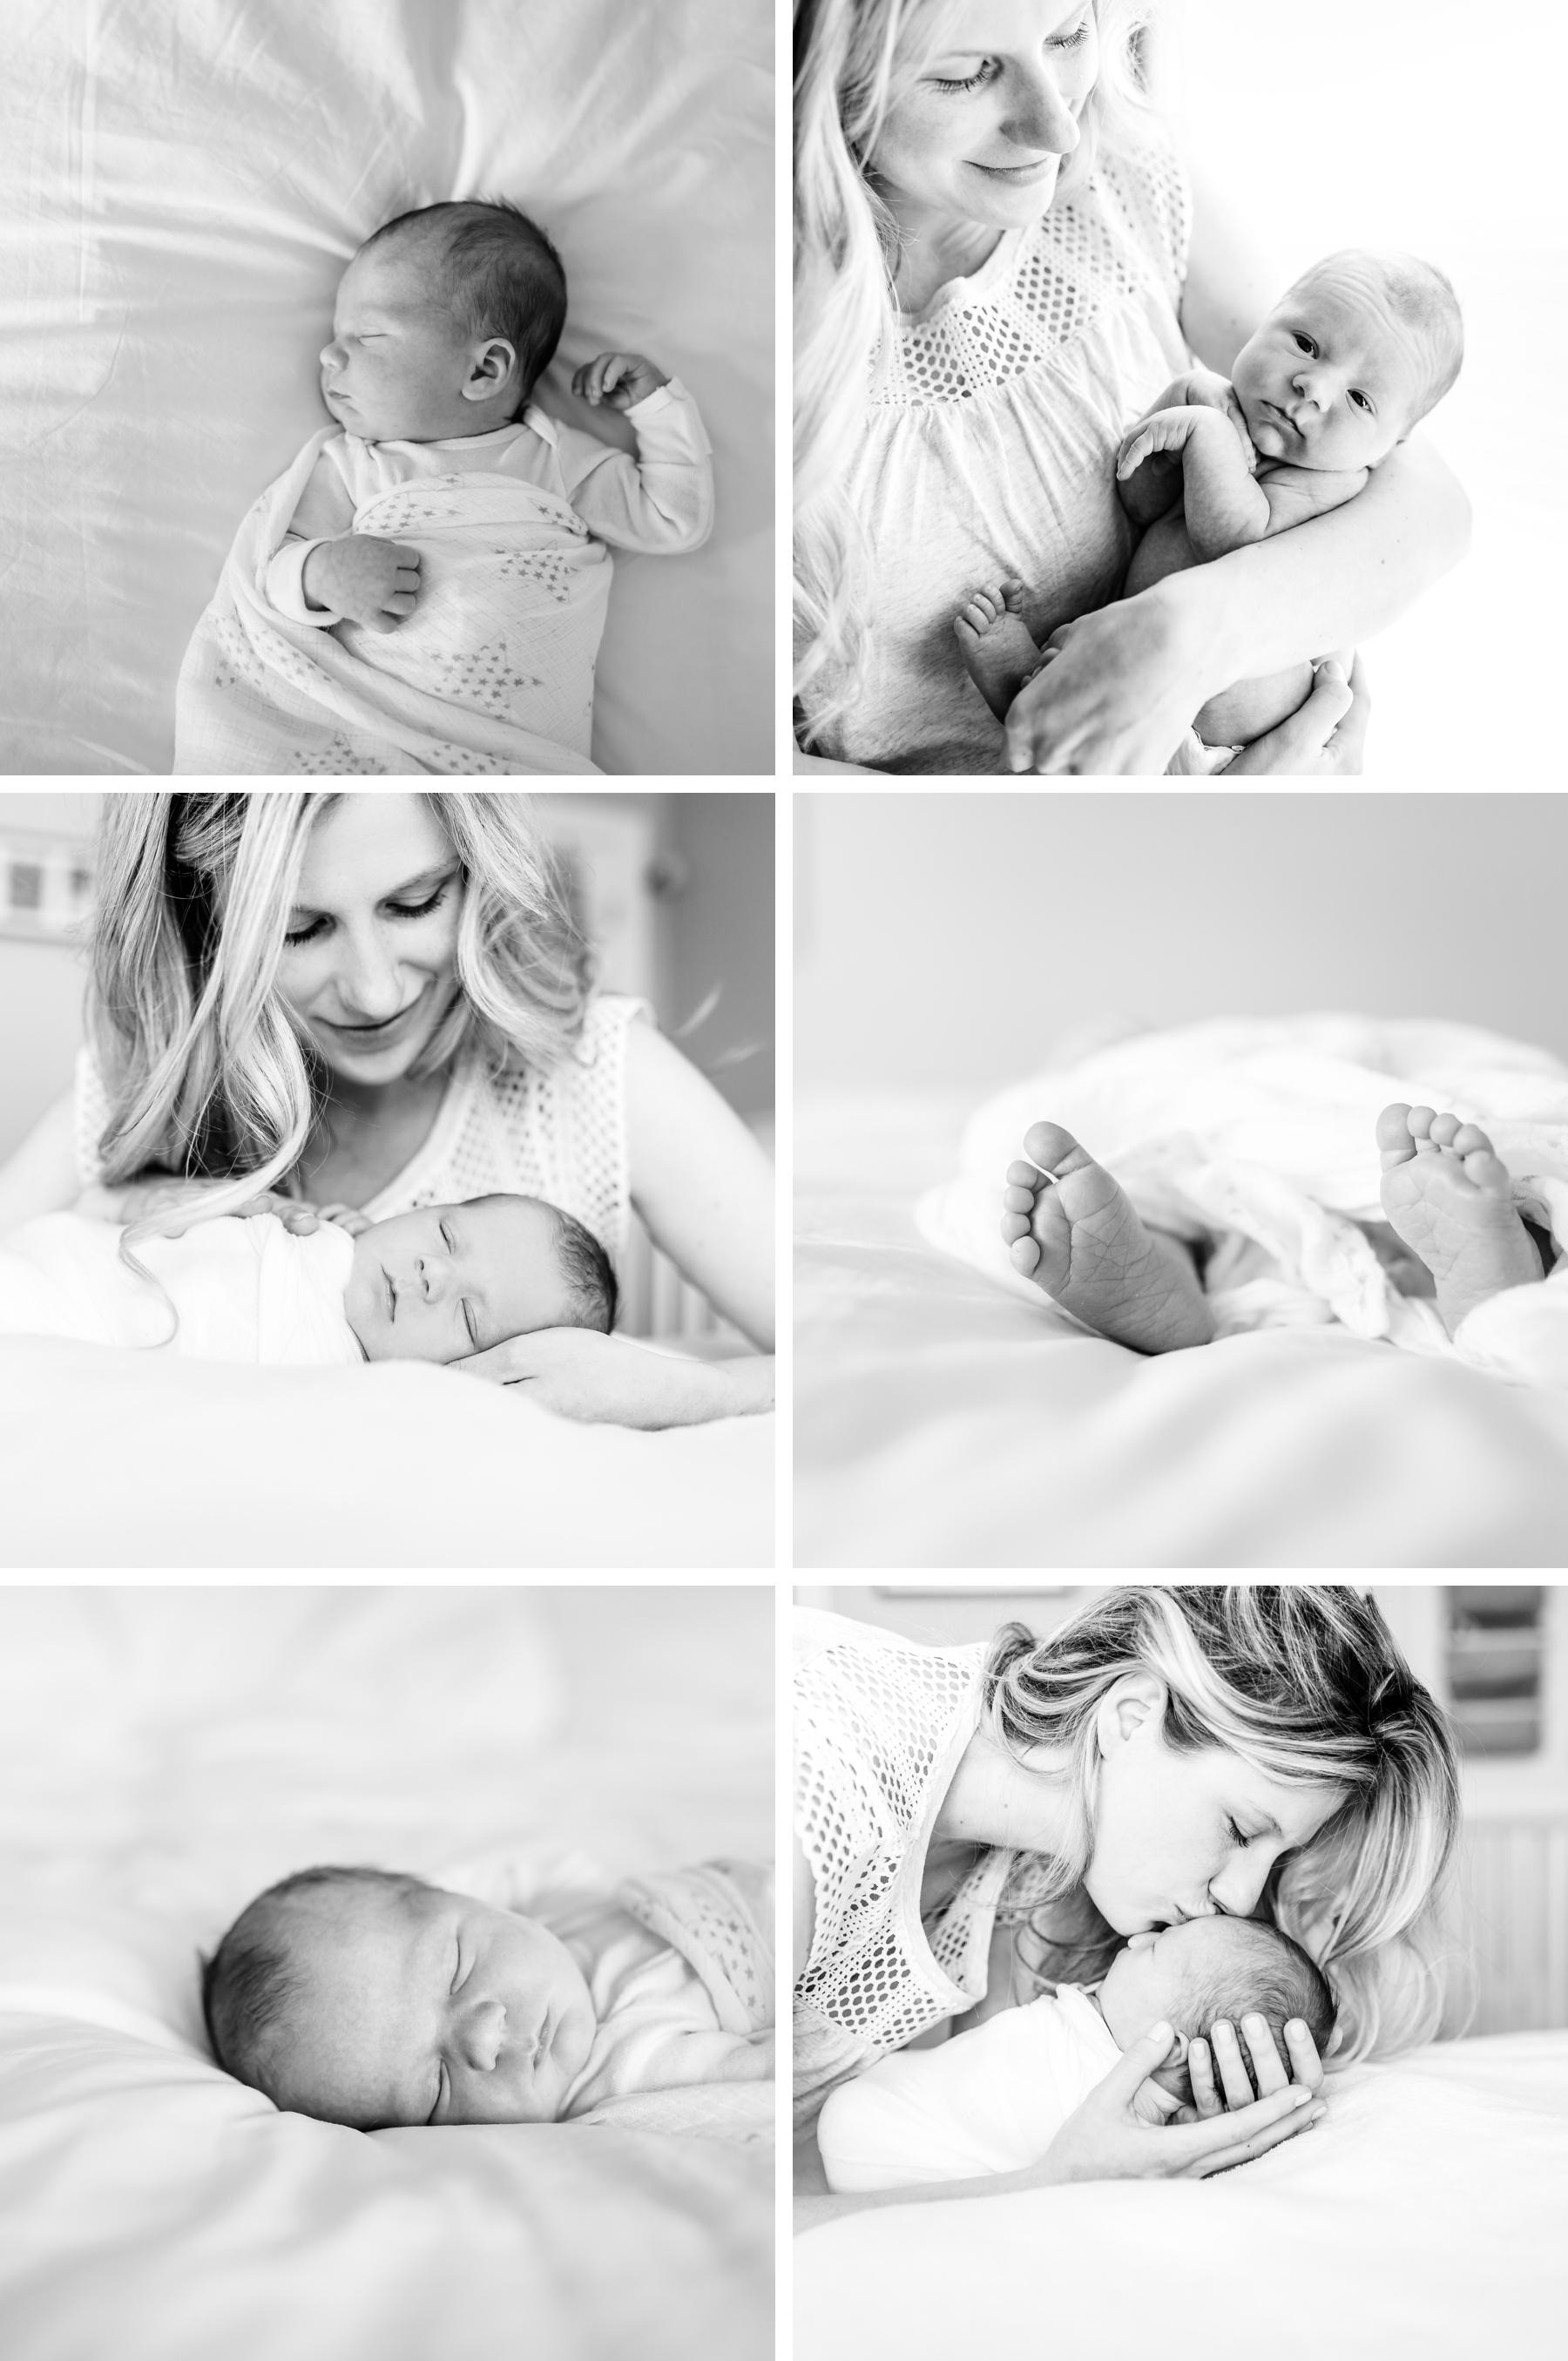 chicago-newborn-modern-lifestyle-photographer-jenny-grimm-photography_0006.jpg